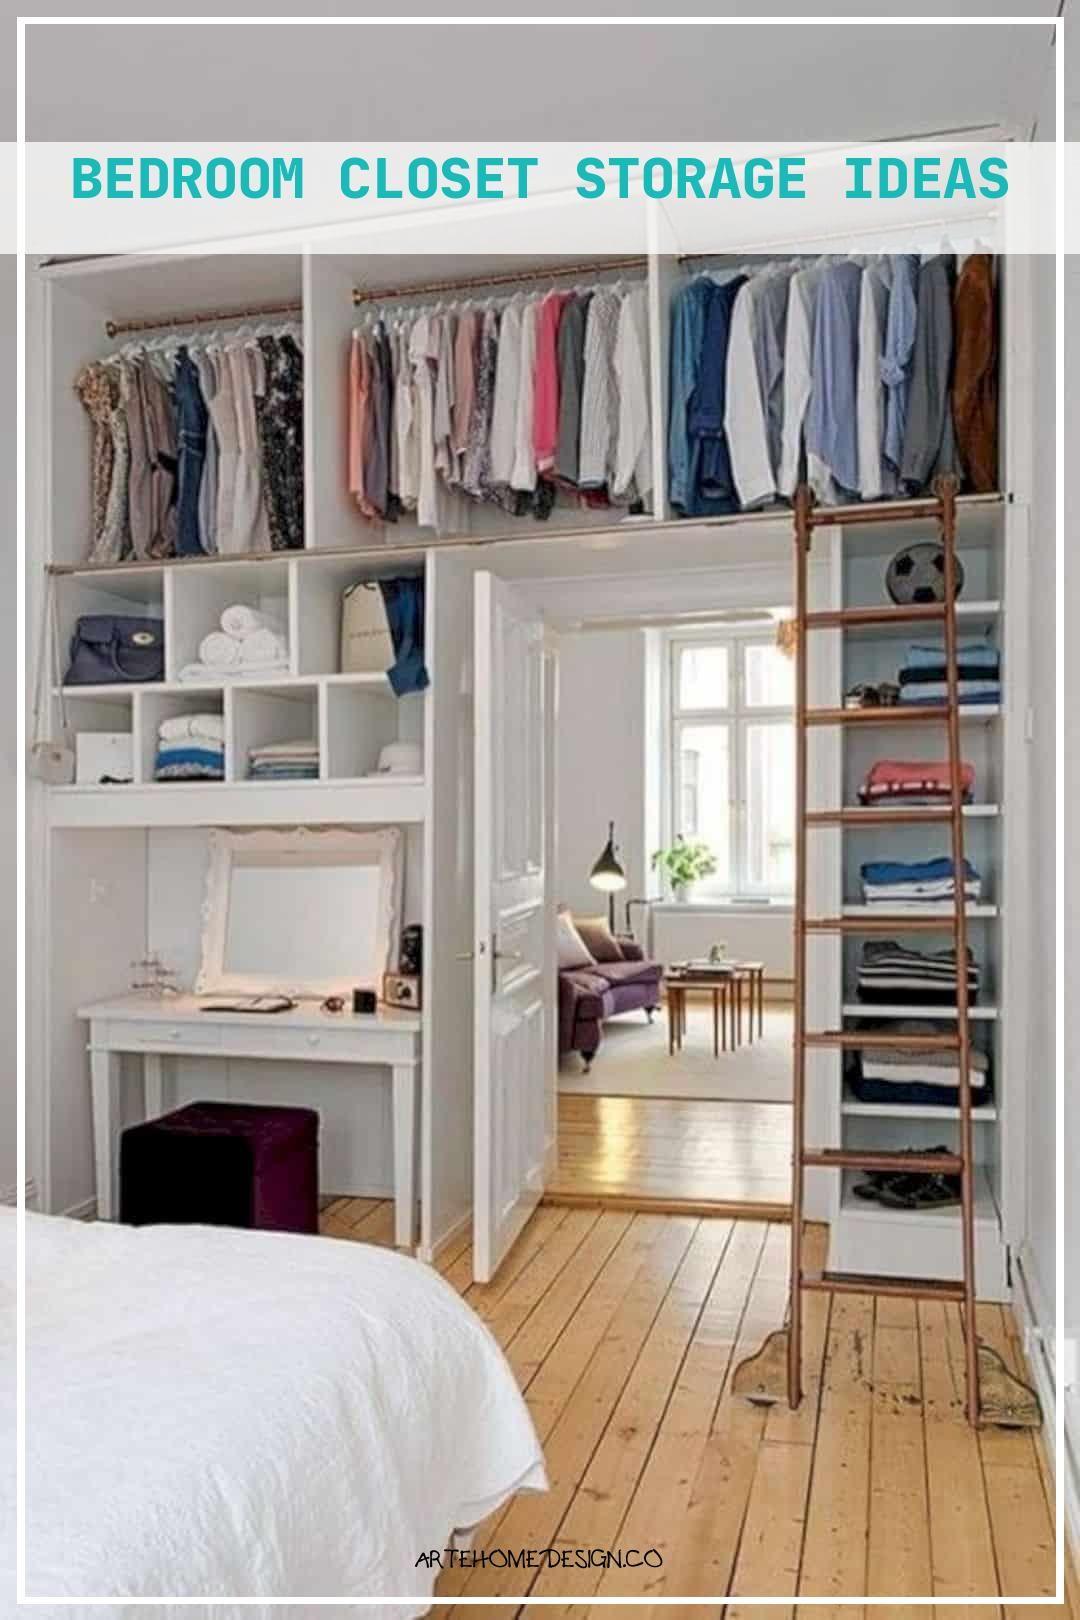 Homedecoration Homedecor Bedroomdecor Bedroomideas Interiordecor Interiordecorationideas Kitchenid In 2020 Bedroom Closet Storage Closet Bedroom Closet Storage